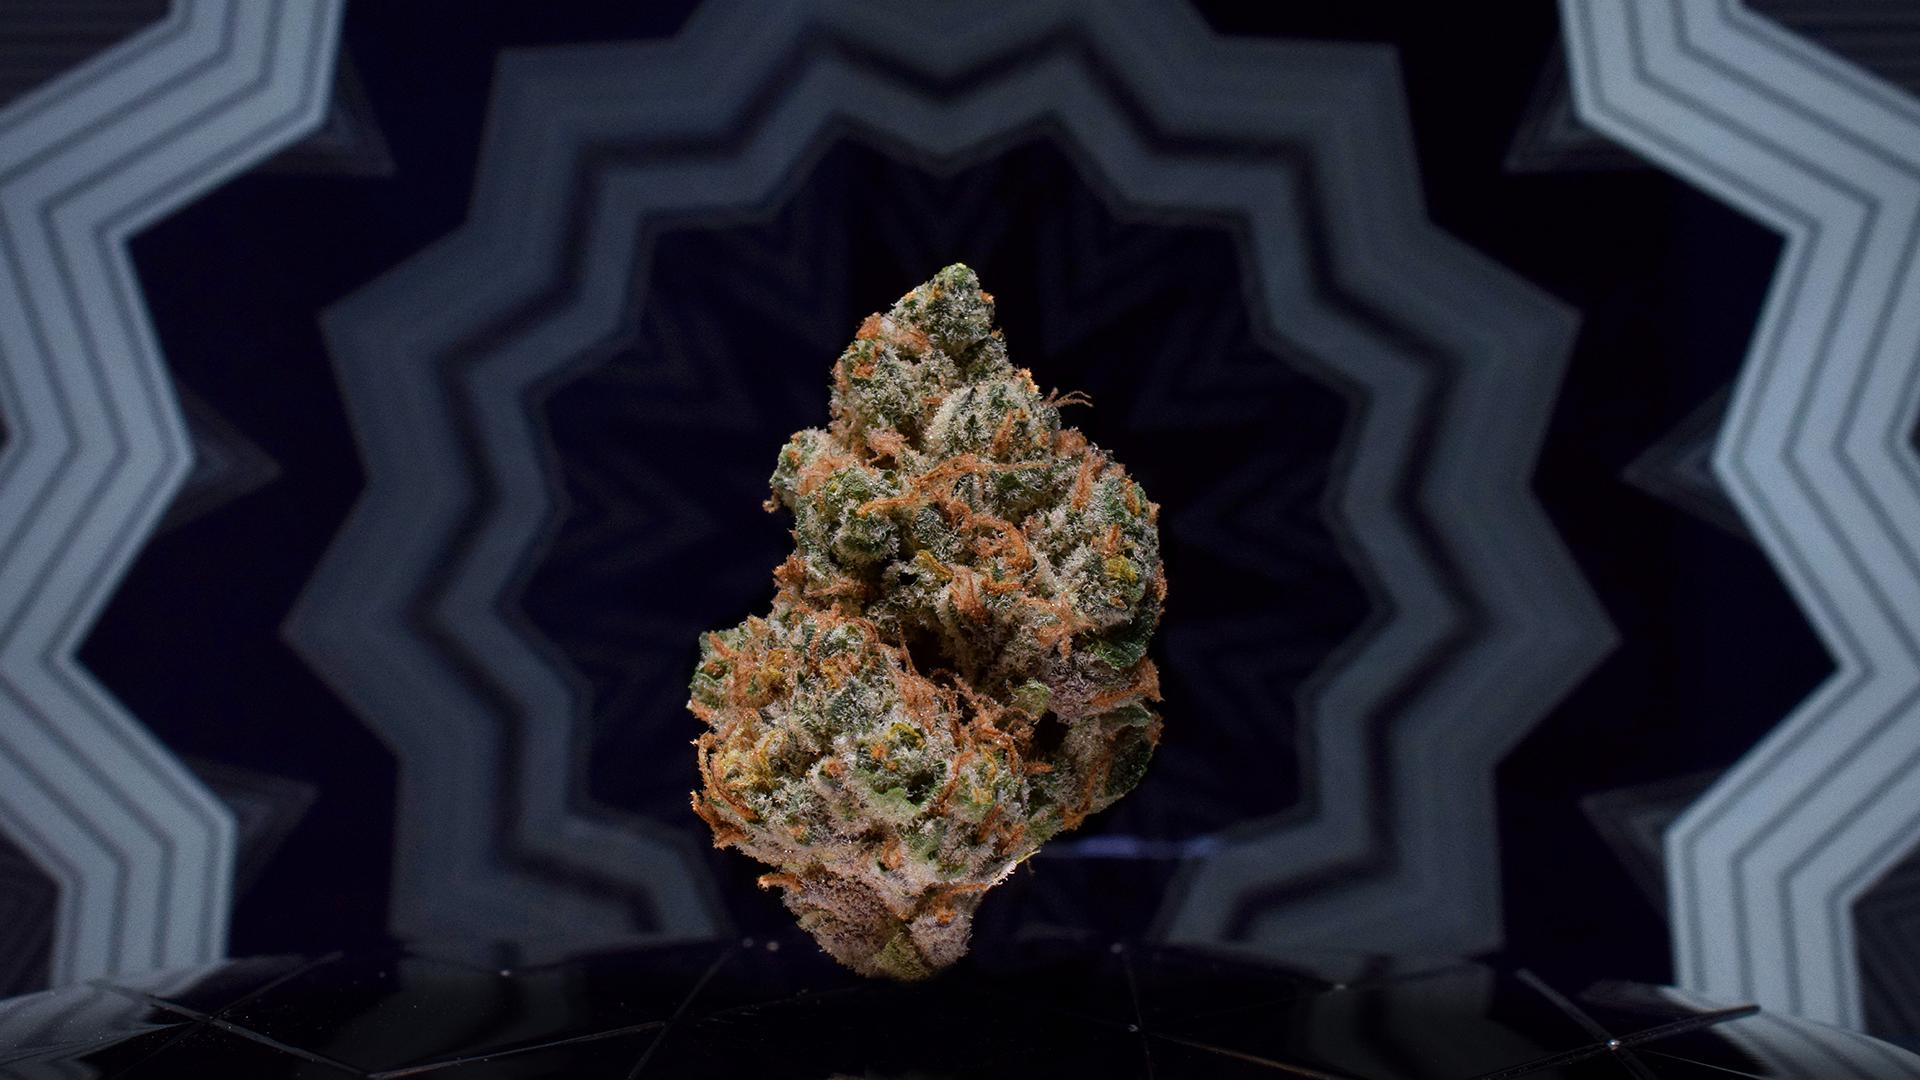 Conjugal Visit #5 Showcase 2 - Woodward Fine Cannabis